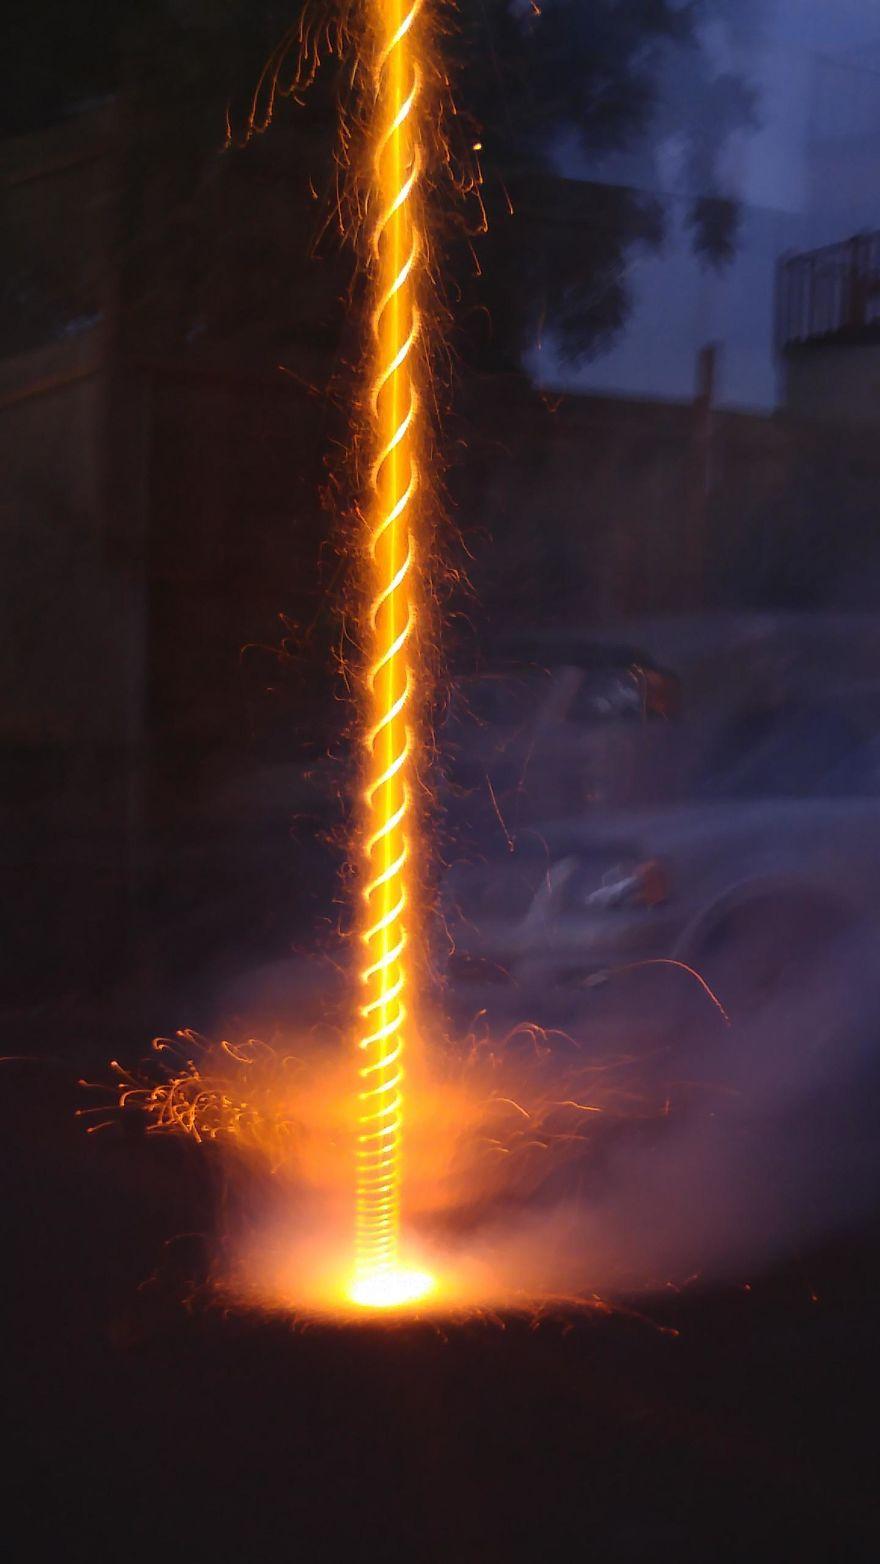 Long Exposure Photograph Of A Firework